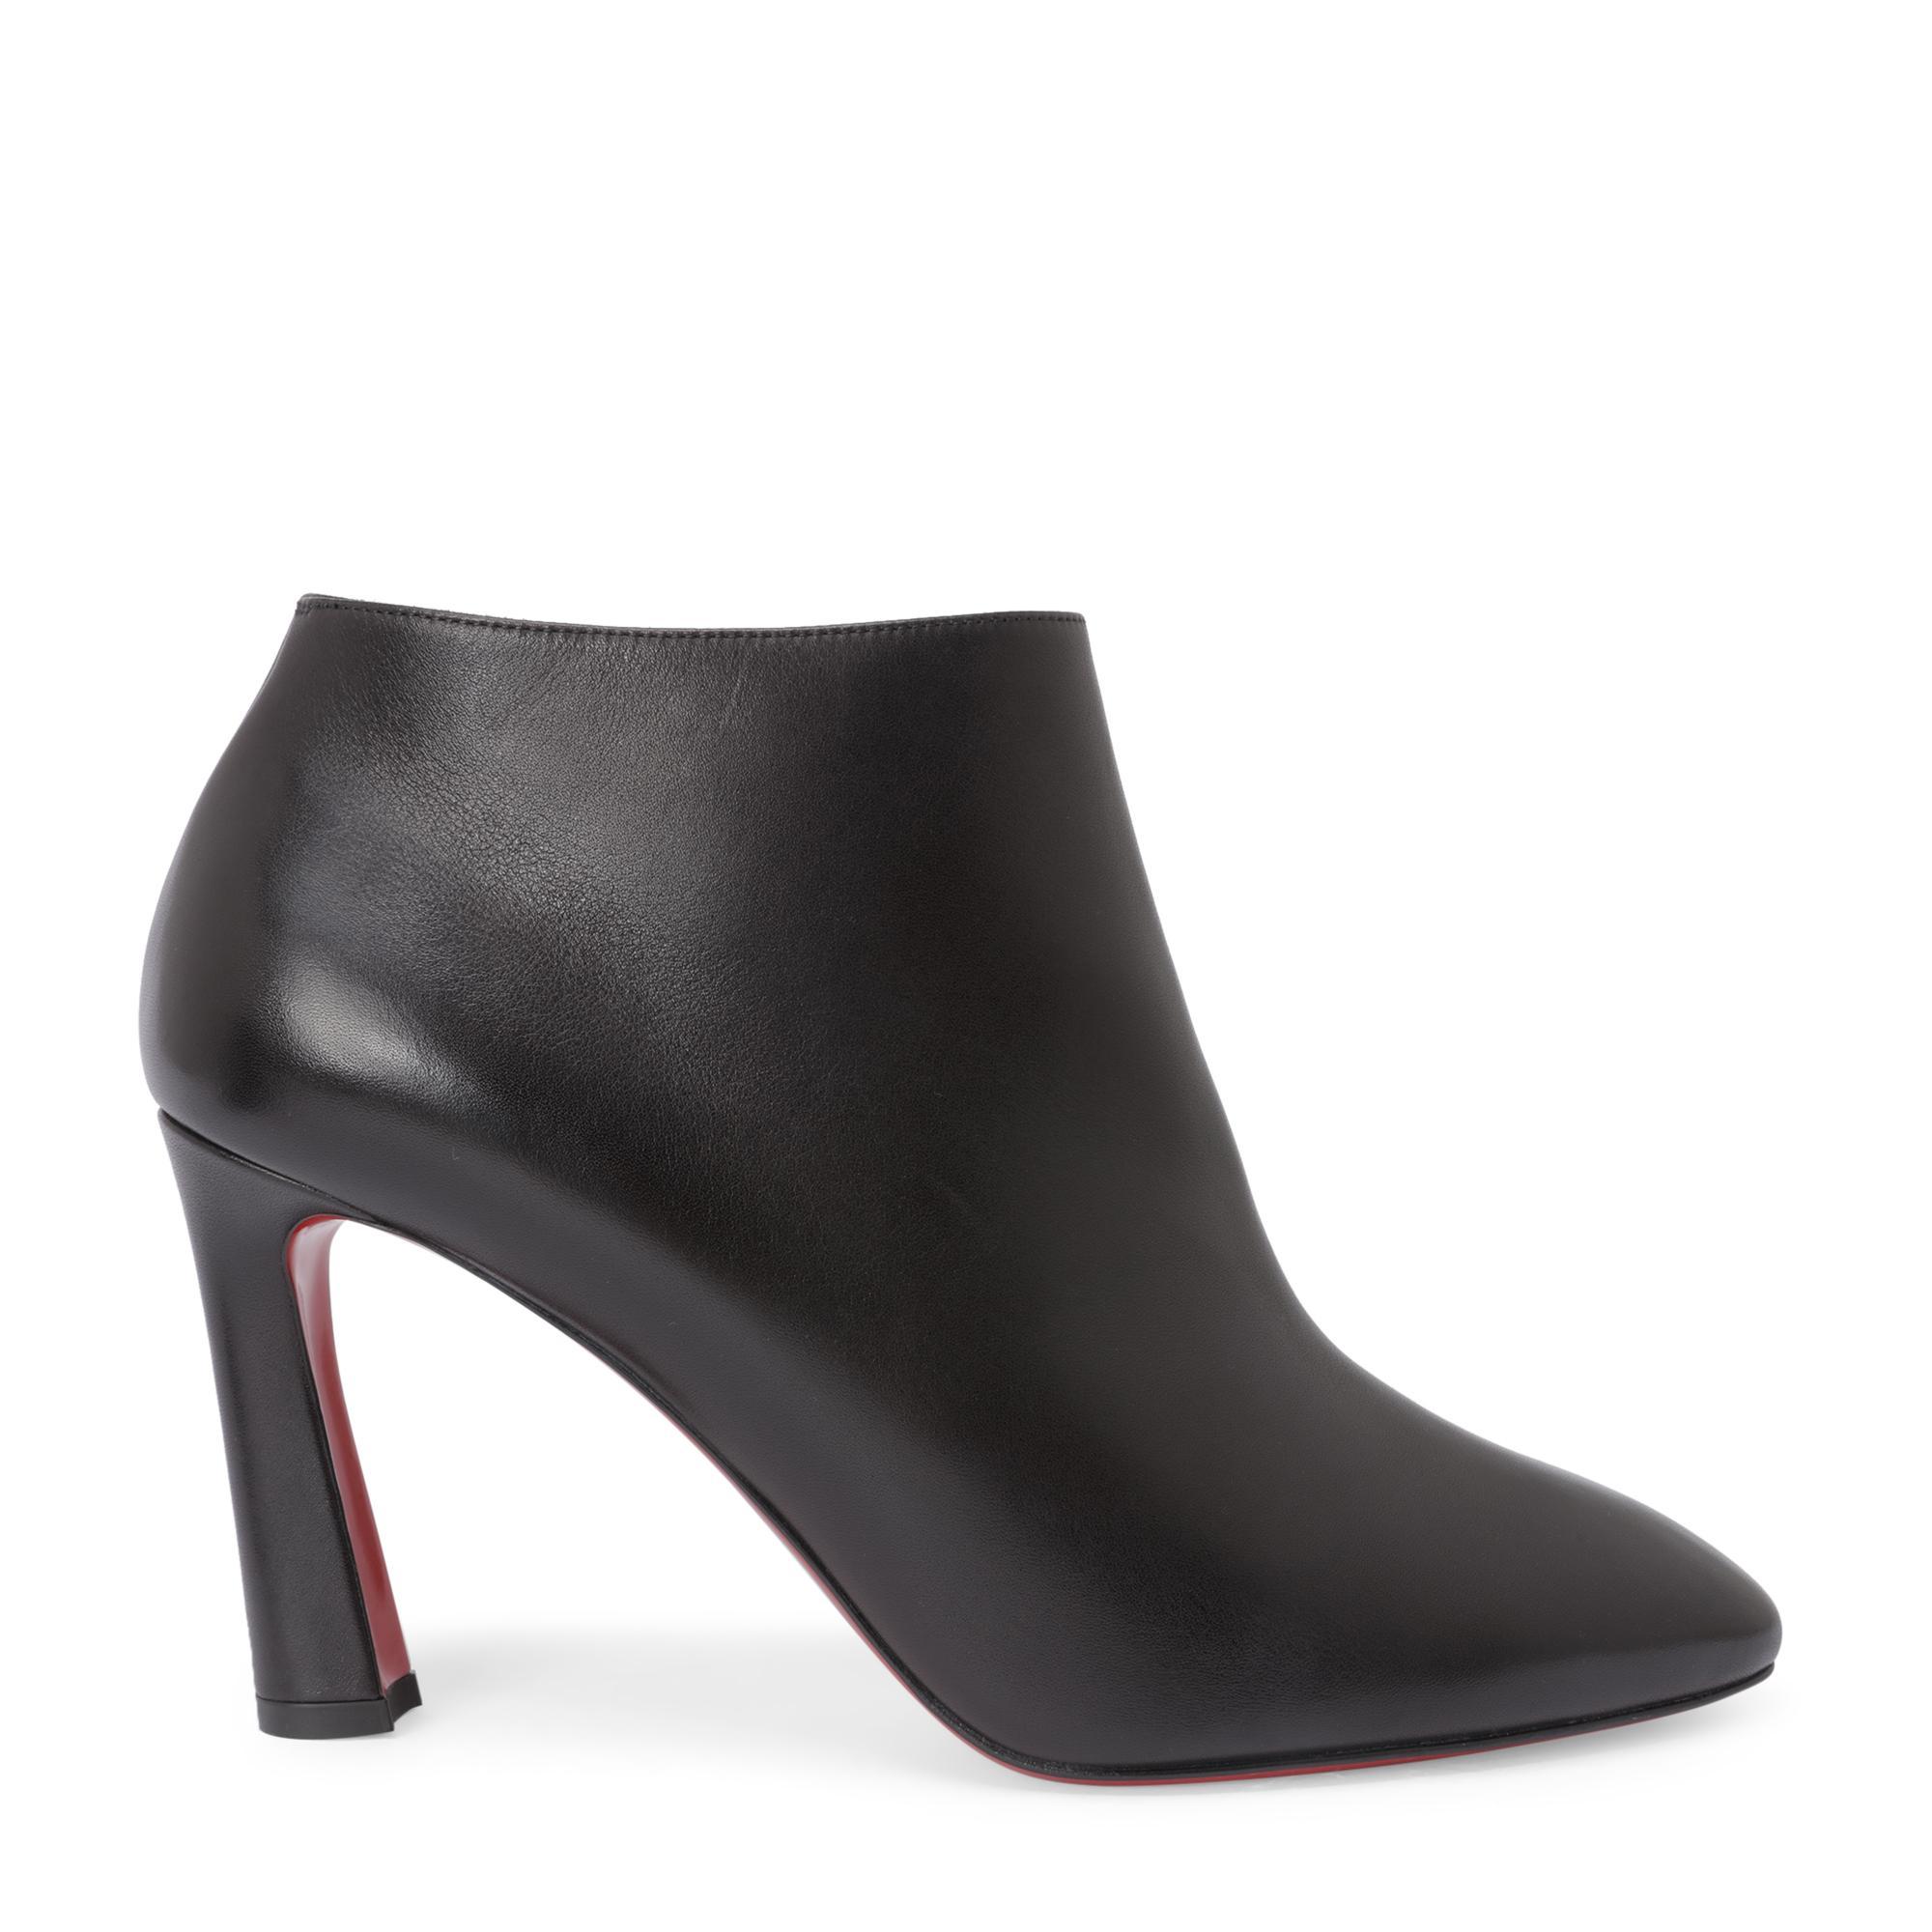 Eleonor 85 boots